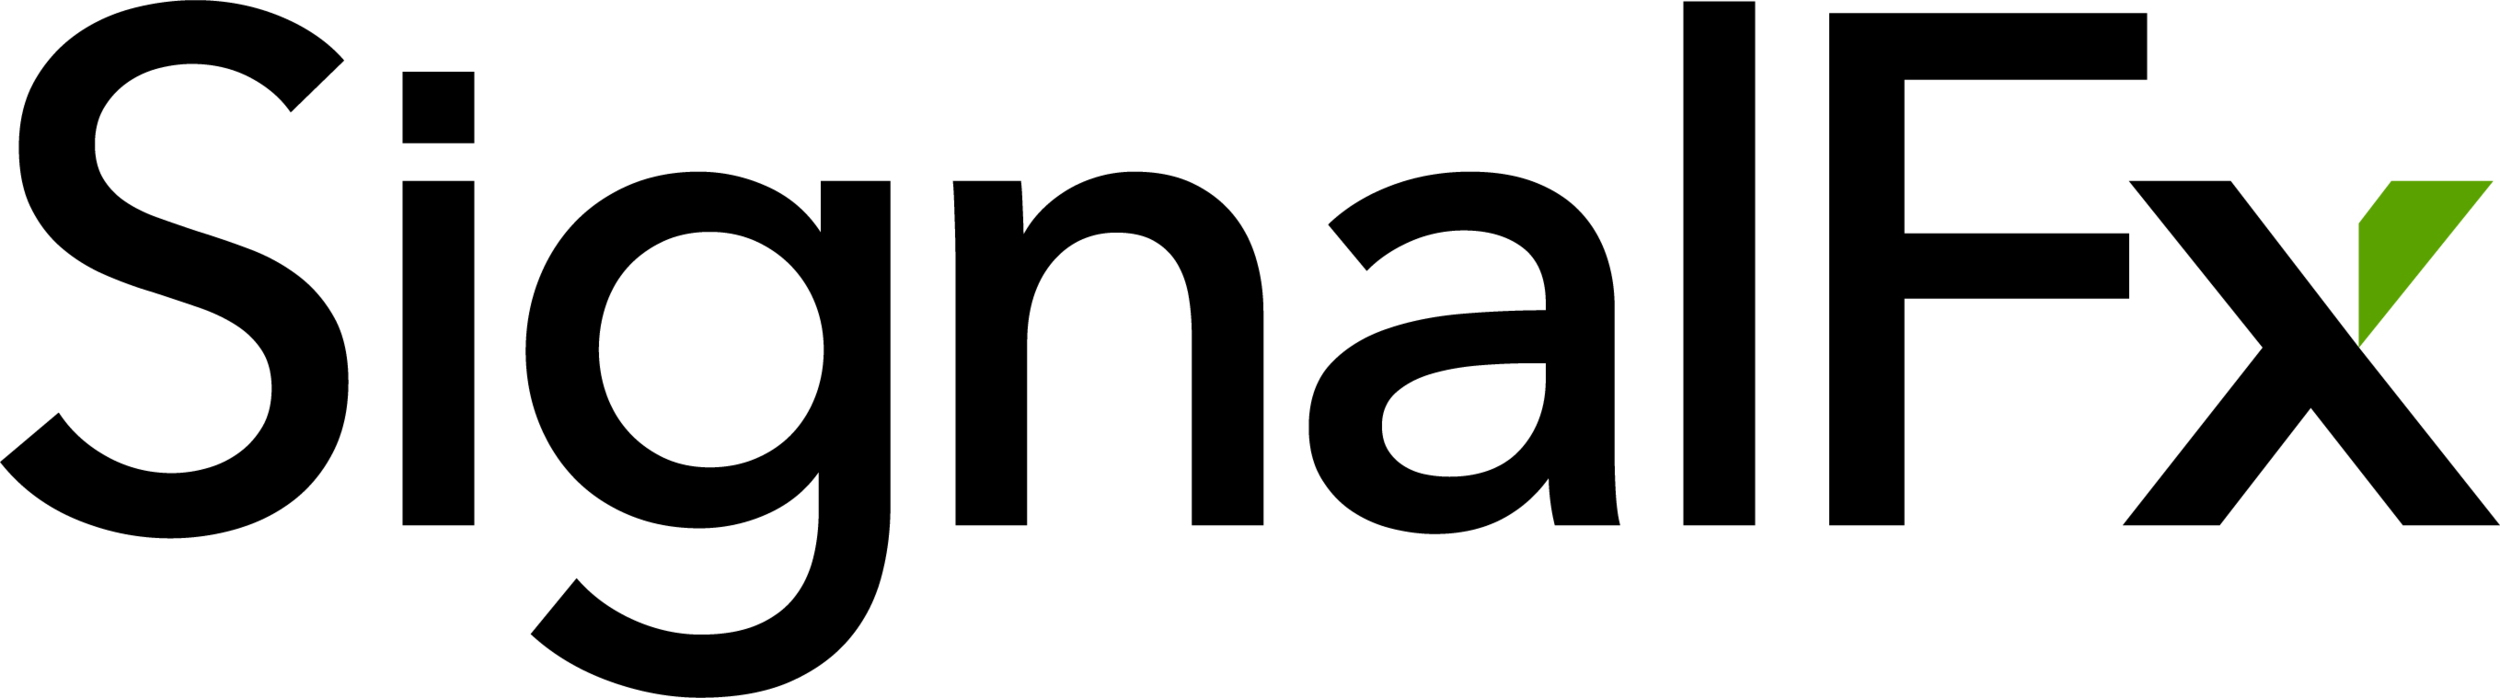 SignalFx Logotype Black Green 700x200px.png